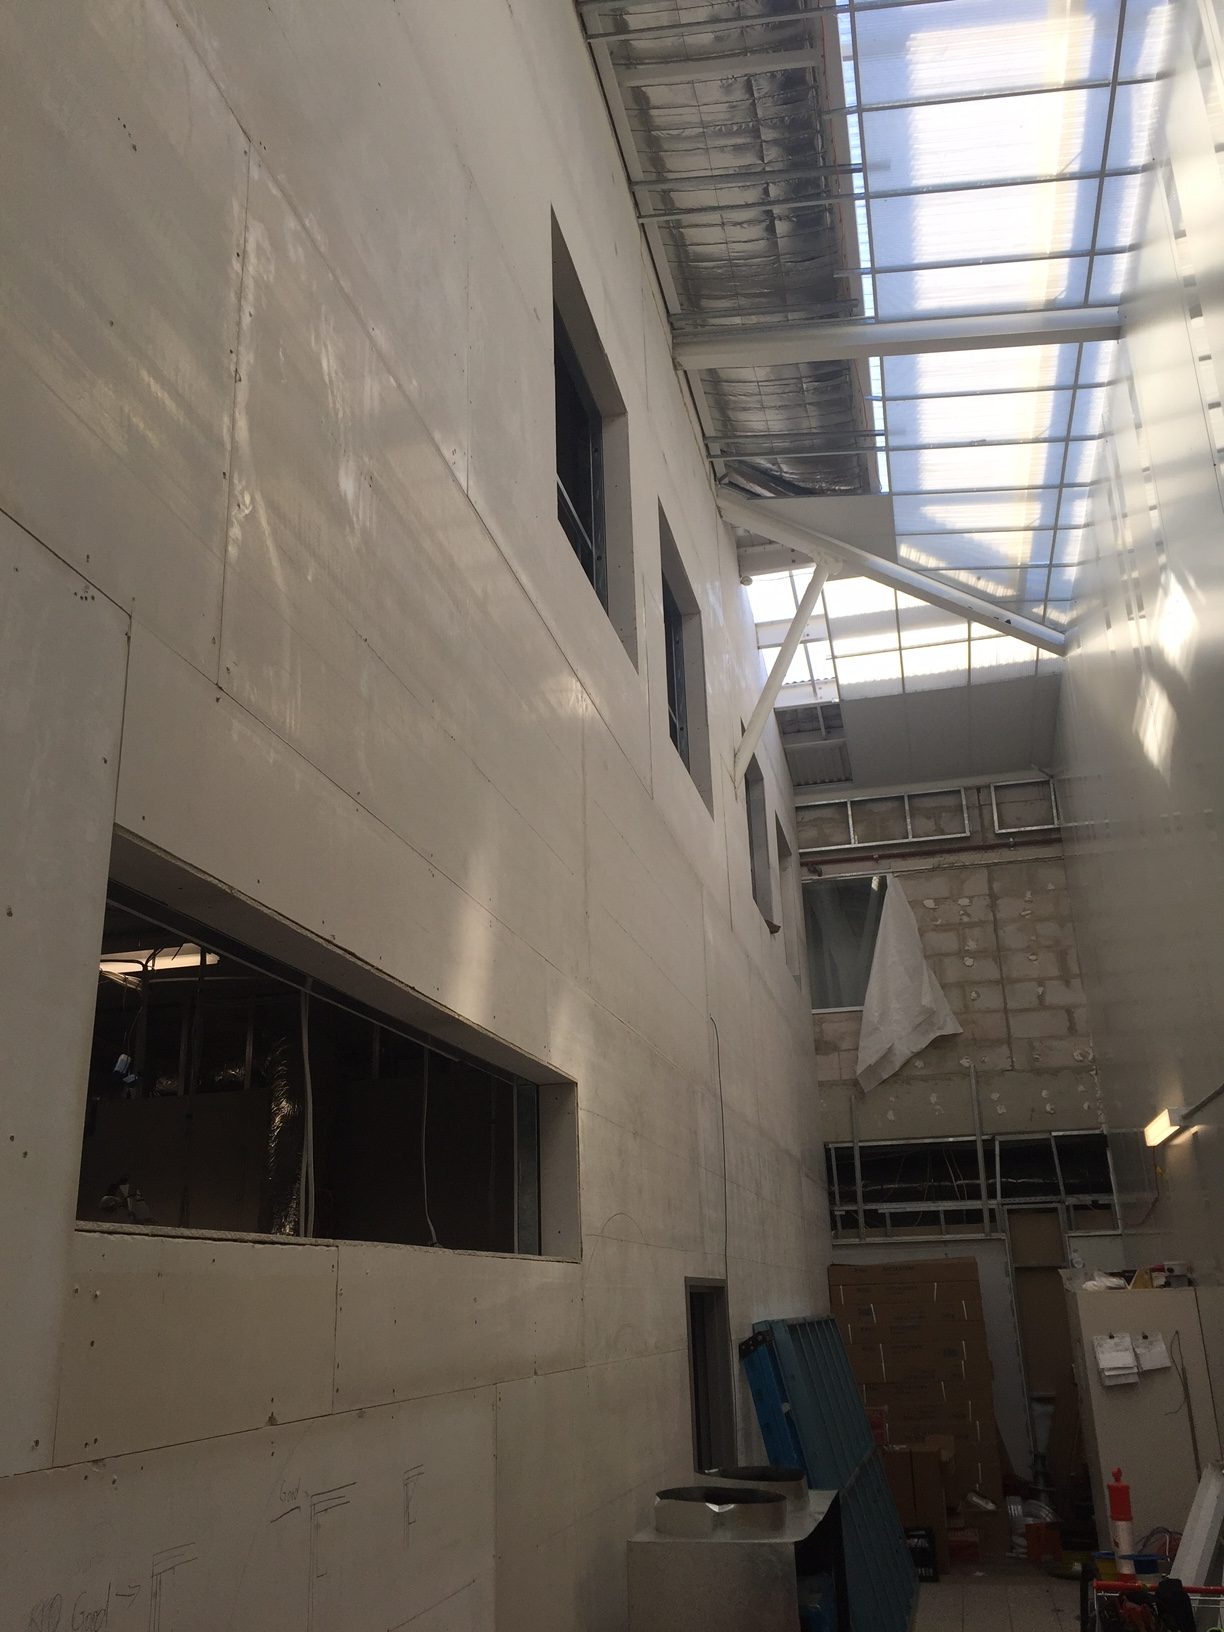 Westmead Children's Hospital Extensions FireCrunch Walls and Mezzanine Floors